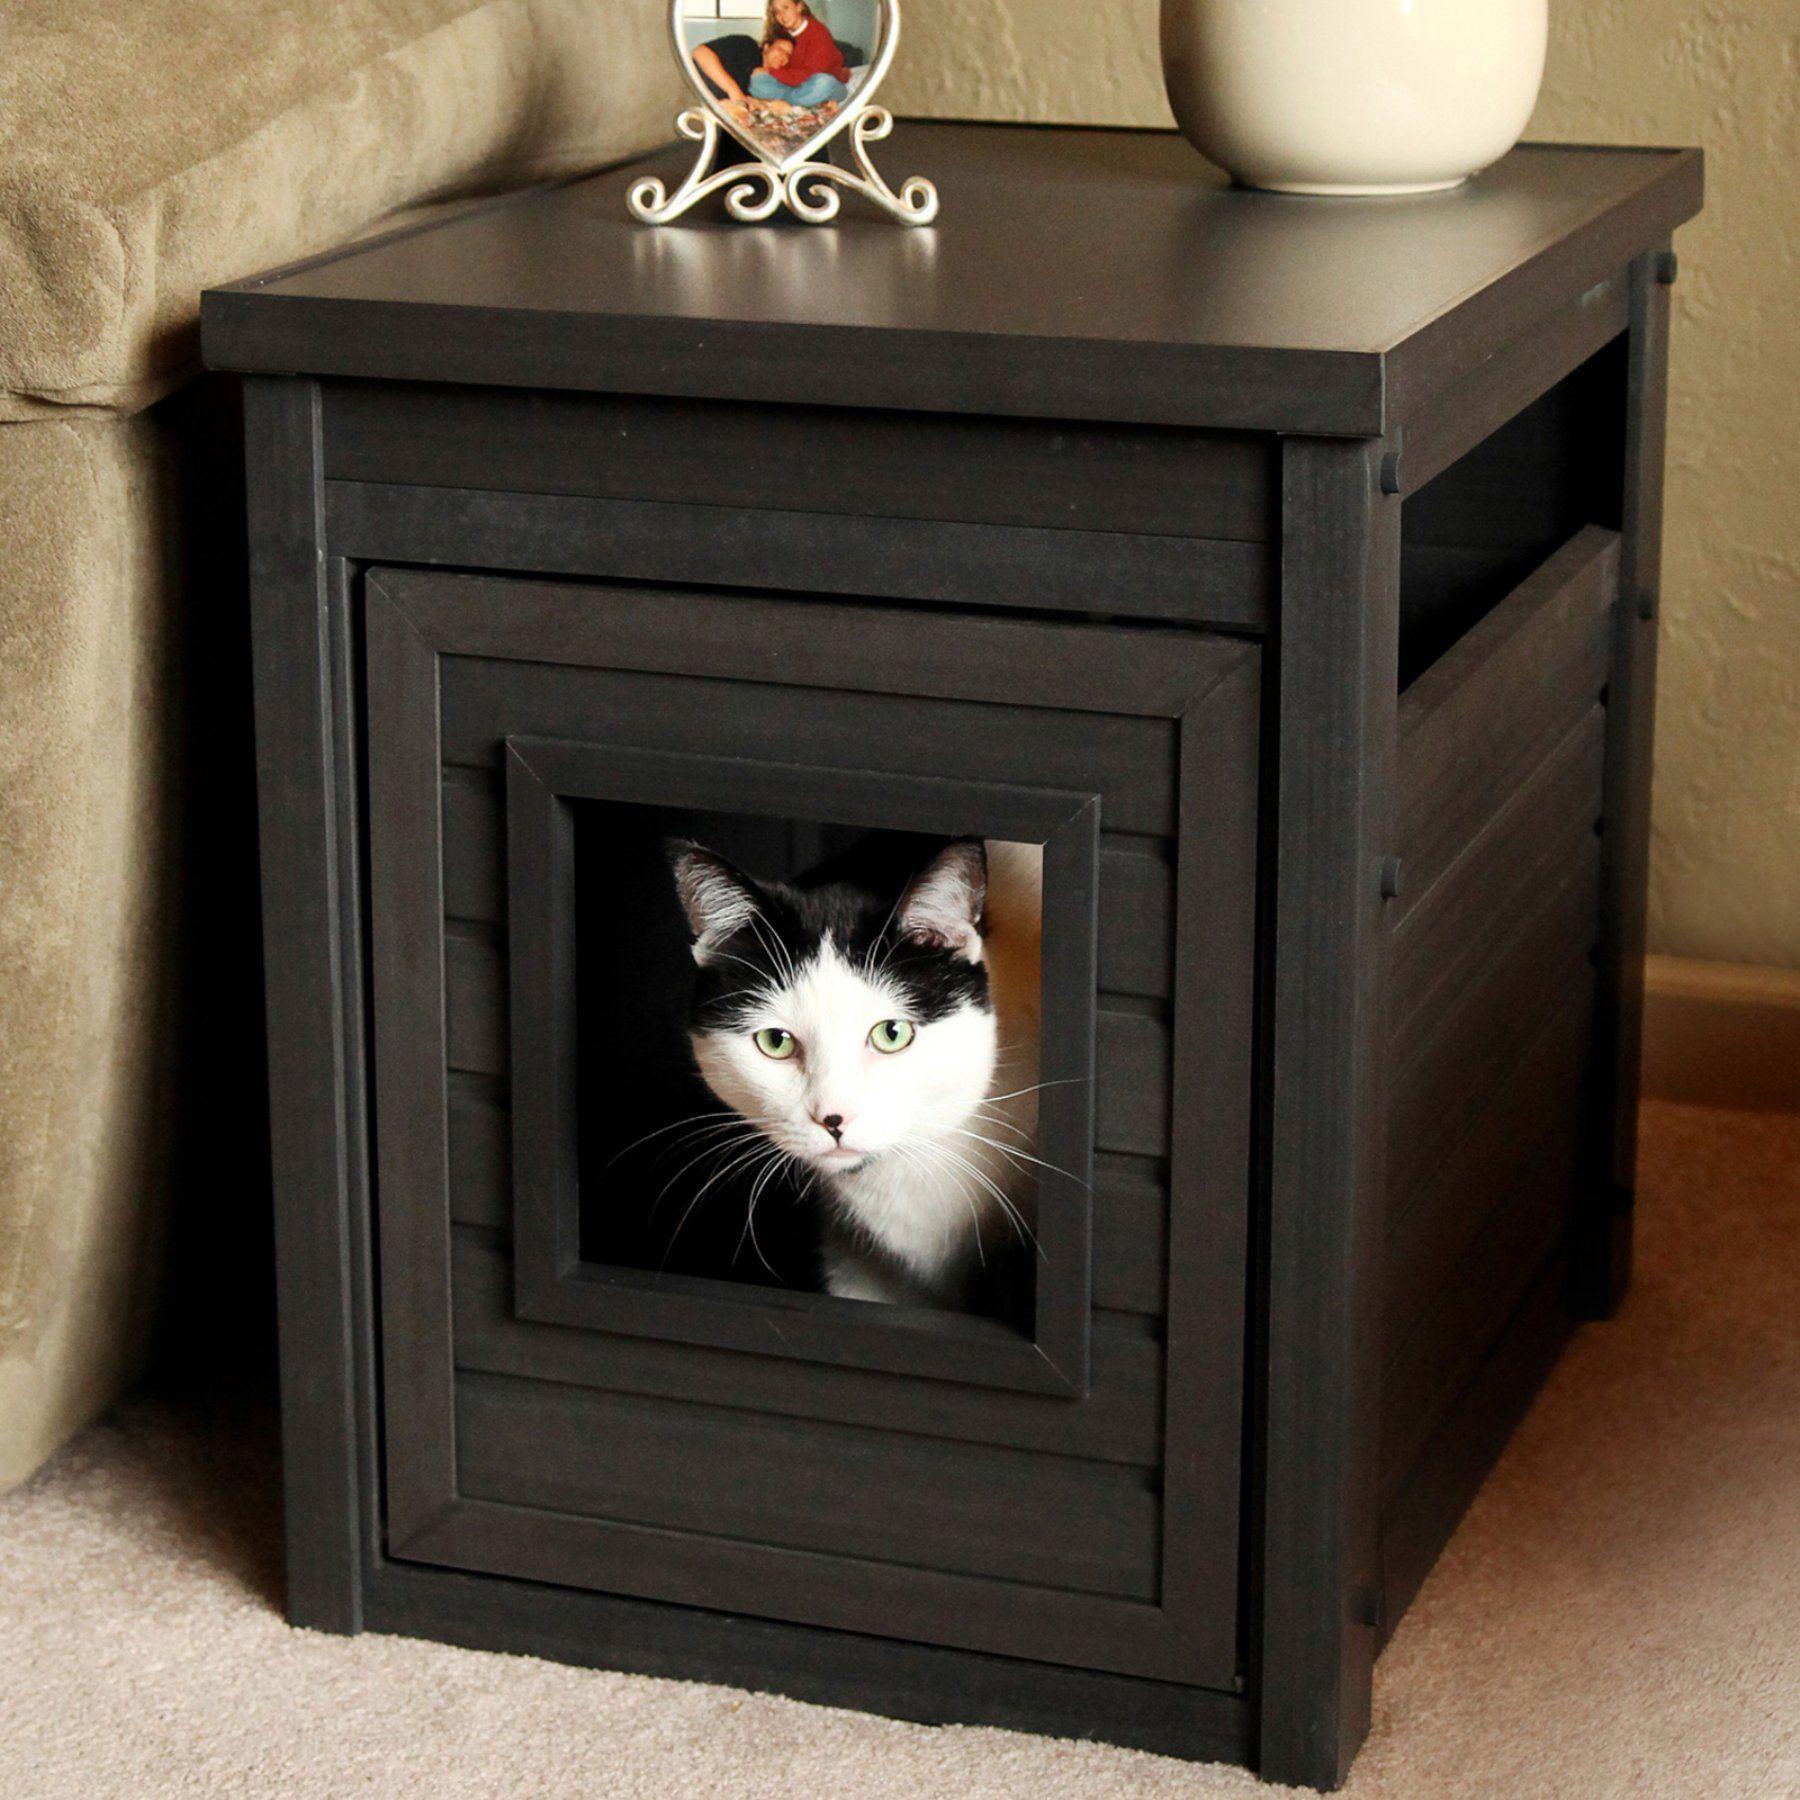 New Age Home Decor: New Age Pet Habitat 'n Home Cat Litter Loo